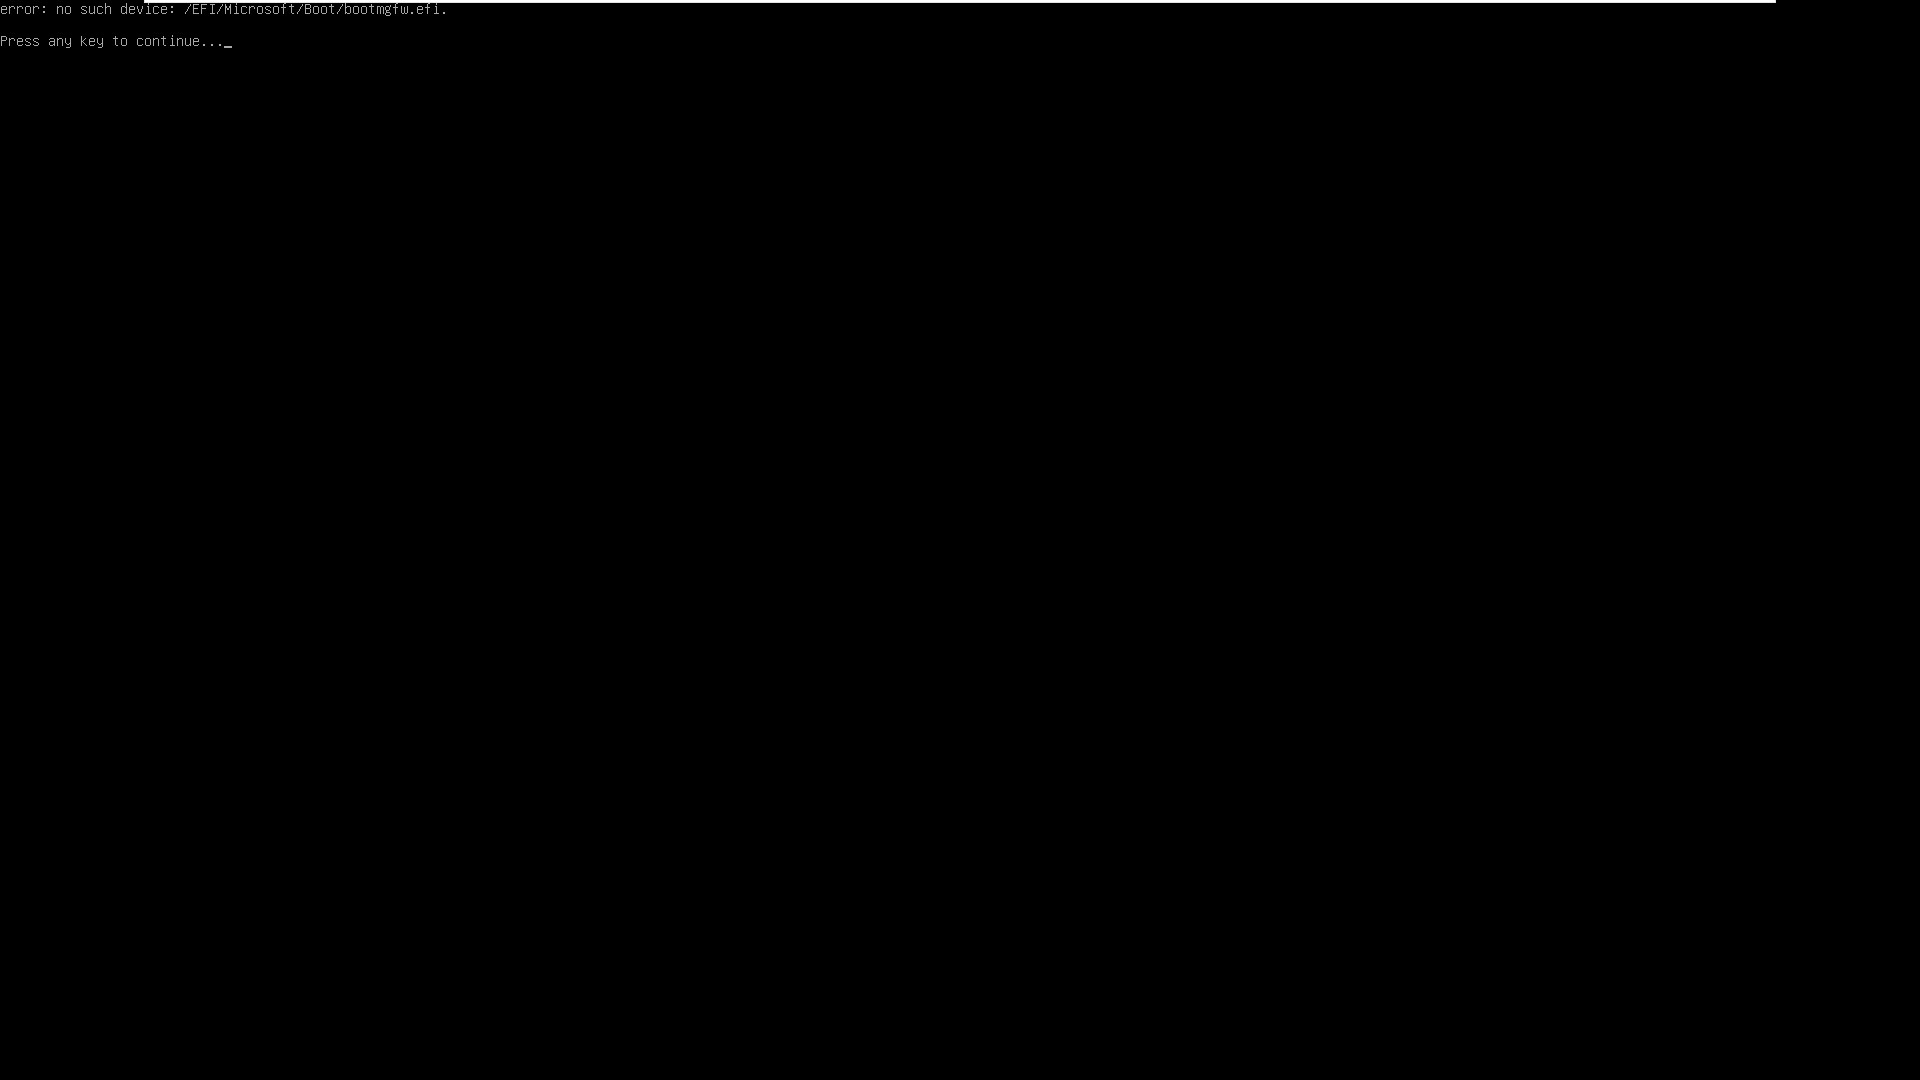 Ventoy 제가 올린 외부 설정 사용하는 방법 2020-09-26_105520.jpg